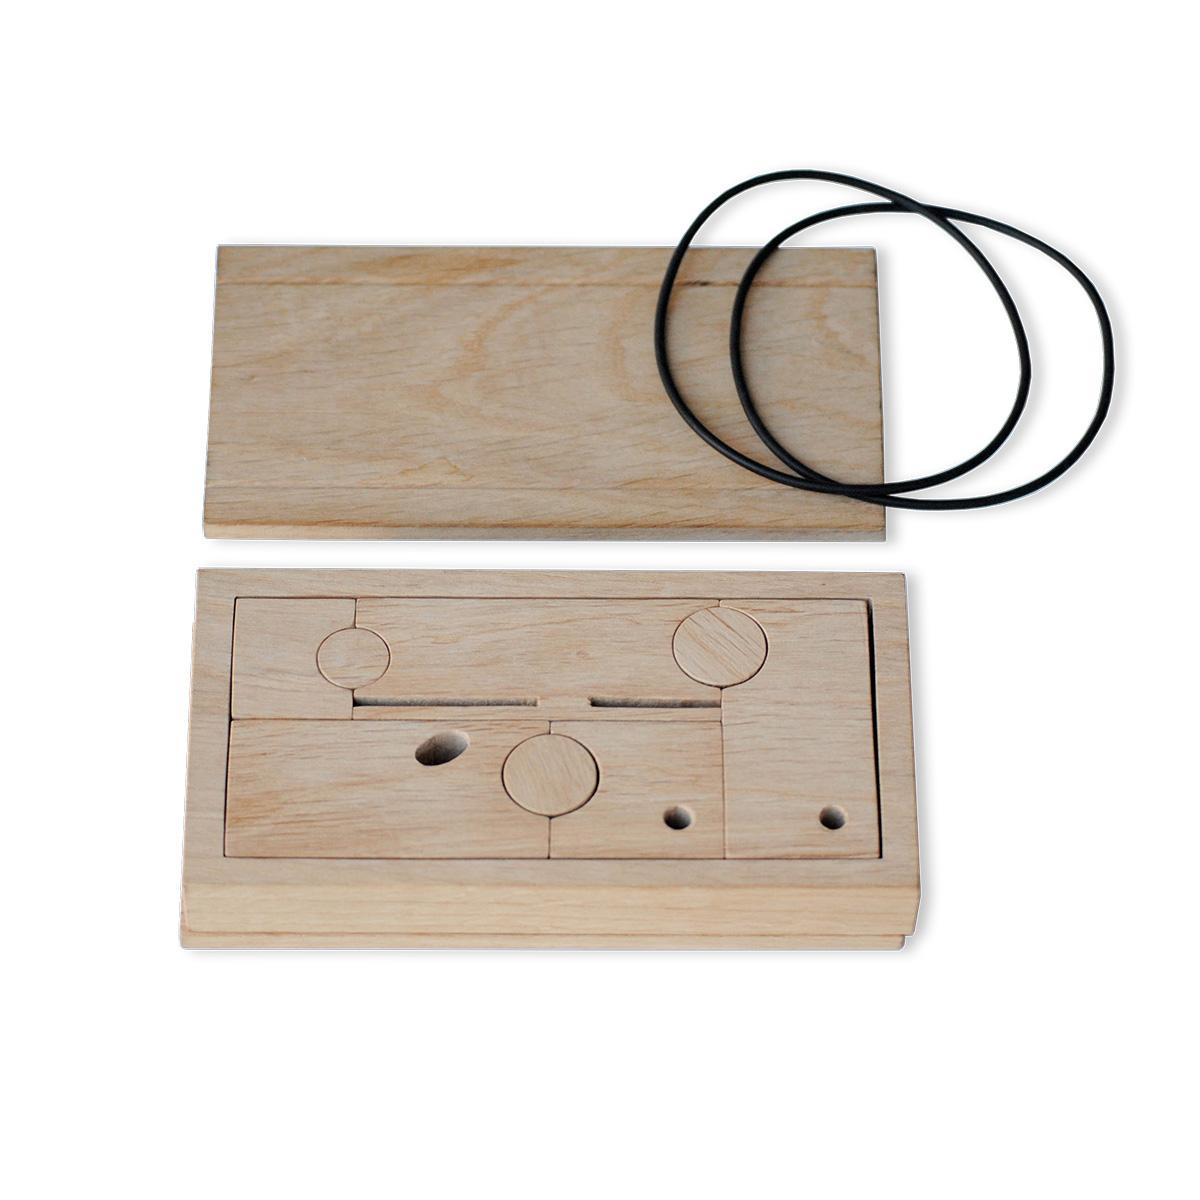 presepe-minimal-design-nativity-tangram-box-wood